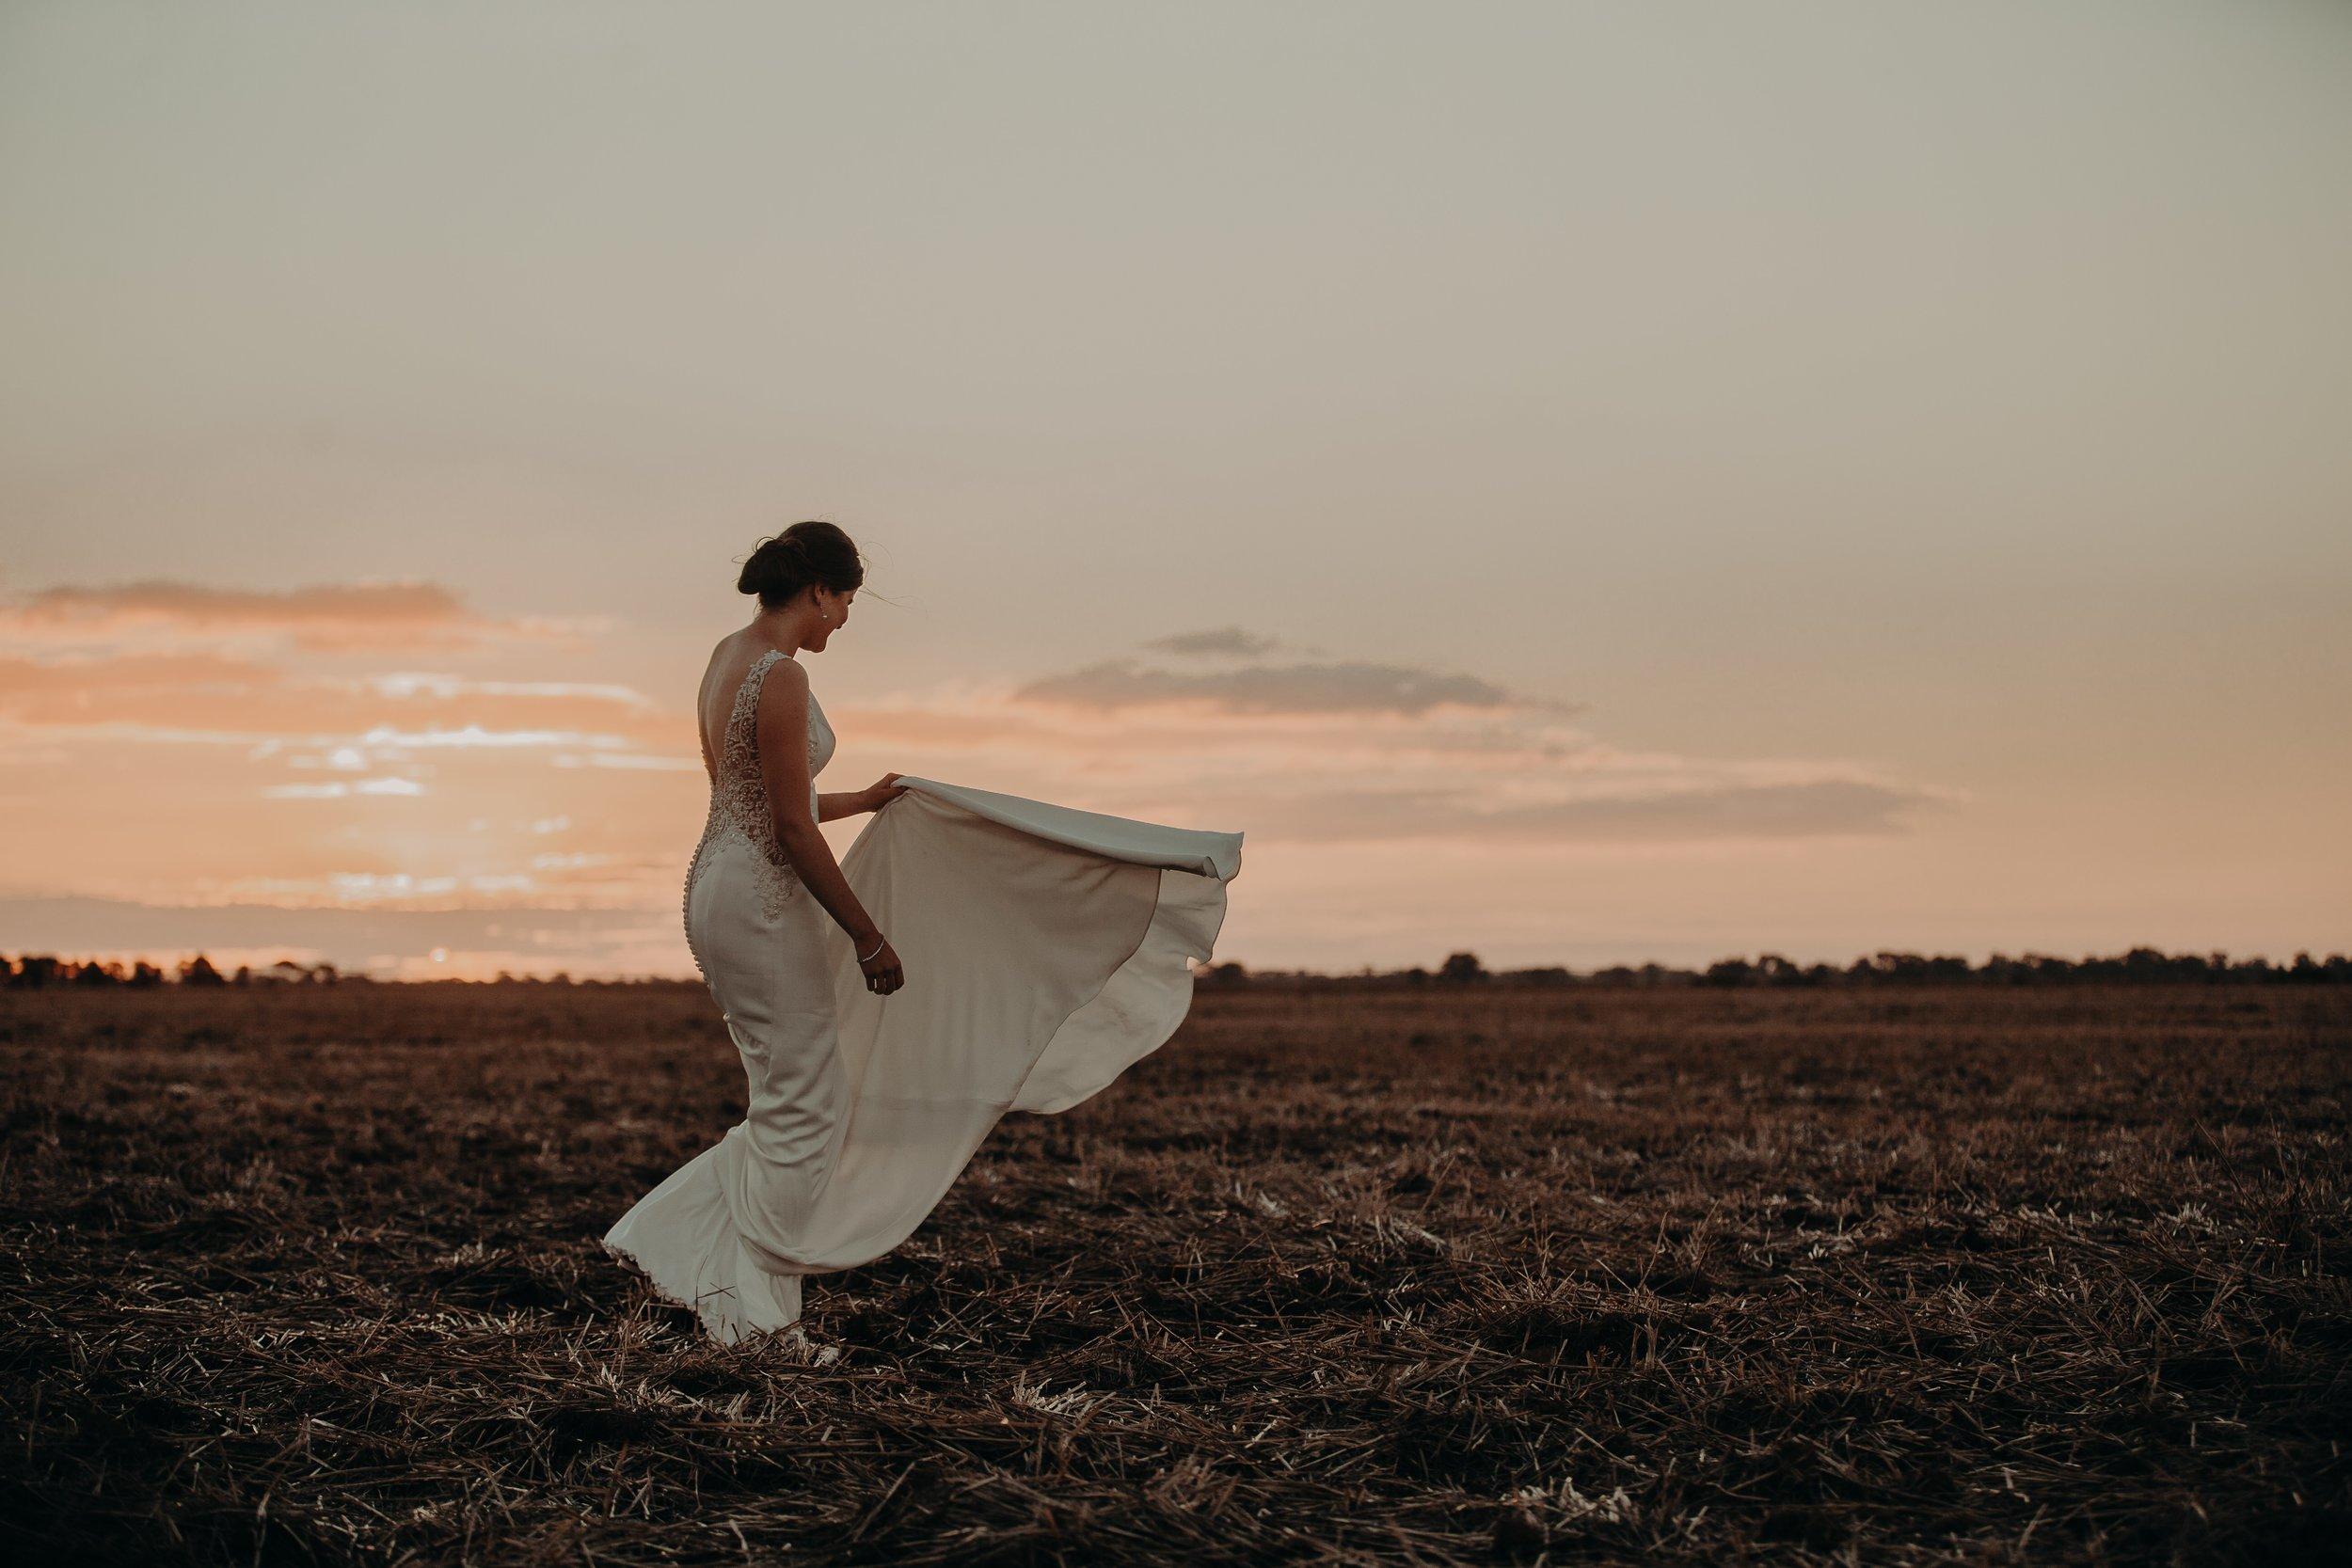 mickalathomas_puremacphotography_weddingphotographer_couplephotographer_Sheppartonphotographer_2575.jpg